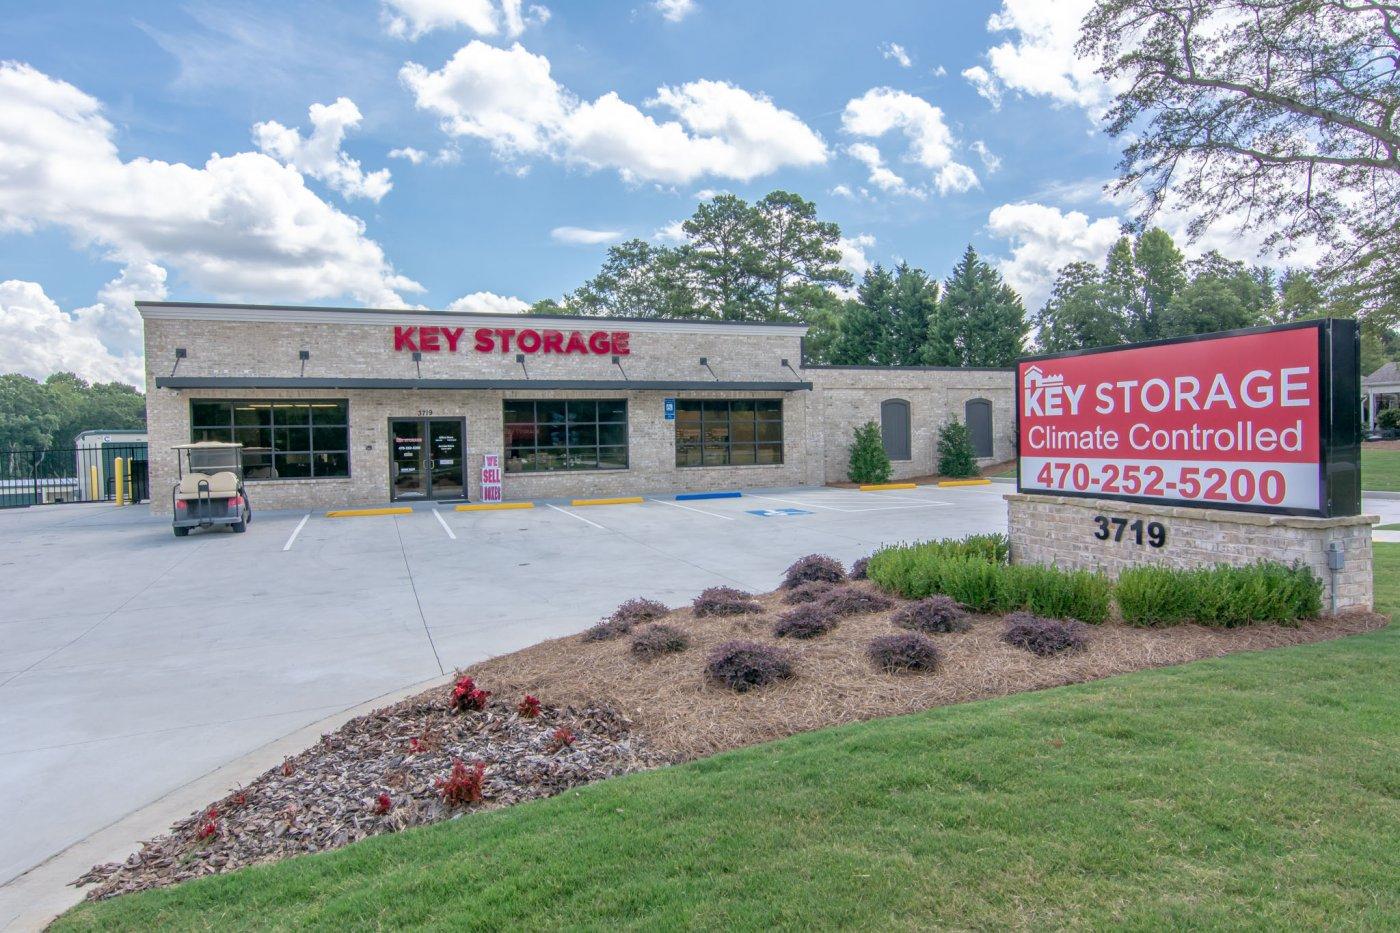 key storage exterior